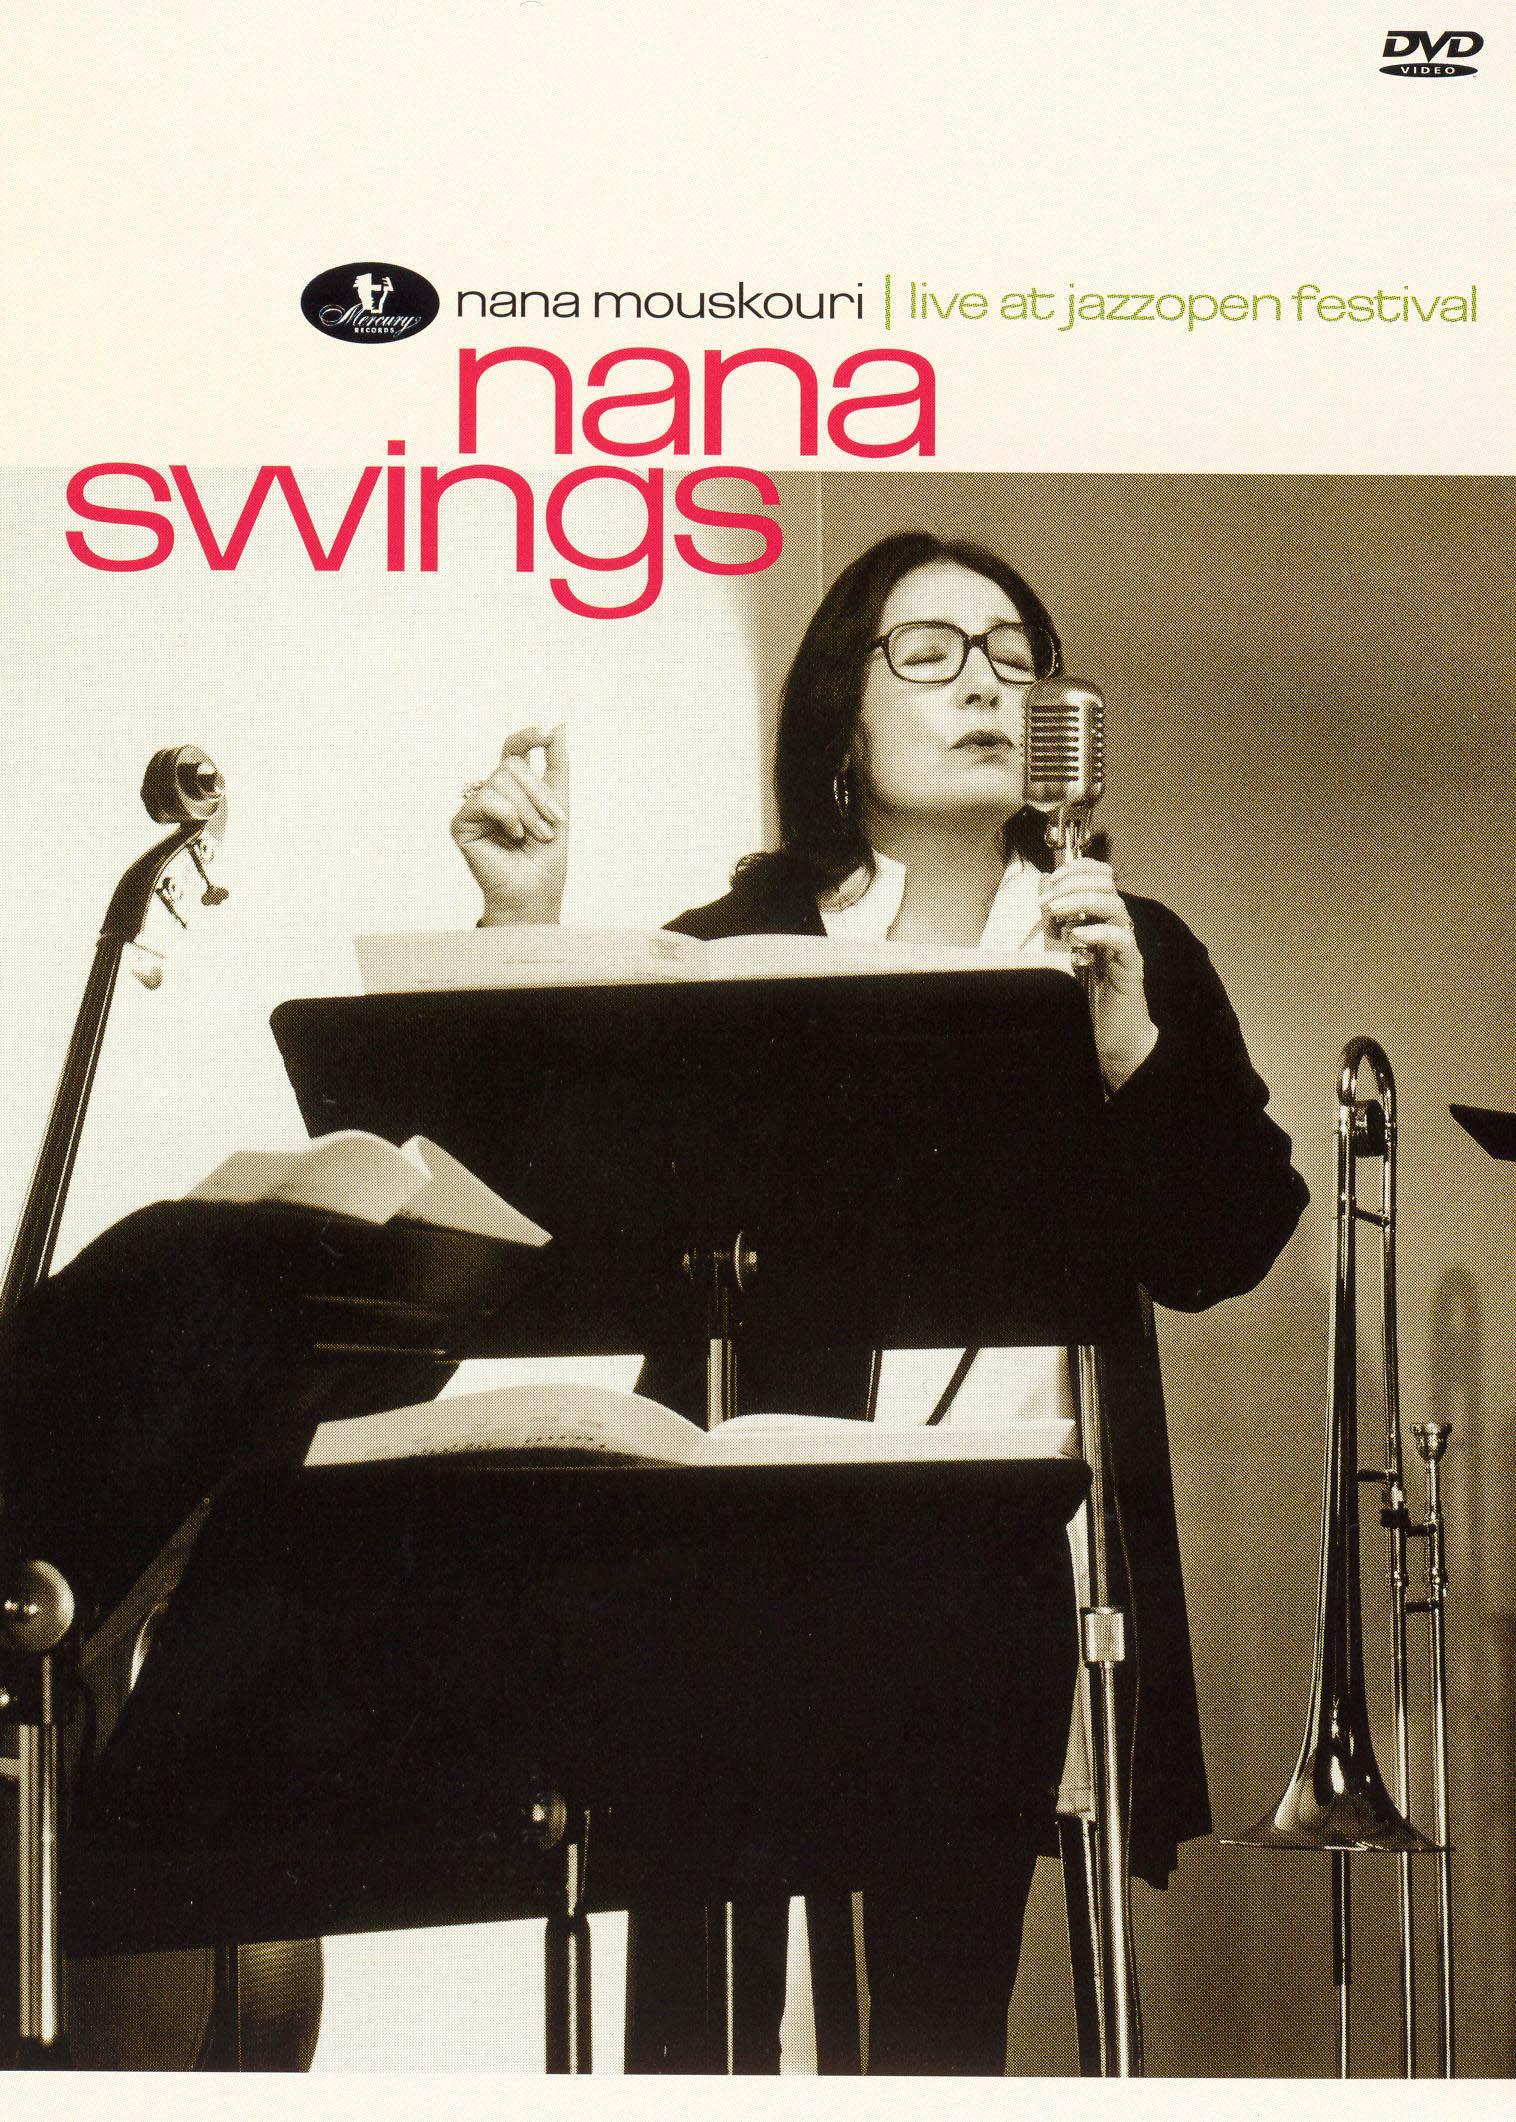 Nana Mouskouri: Nana Swings - Live at Jazzopen Festival